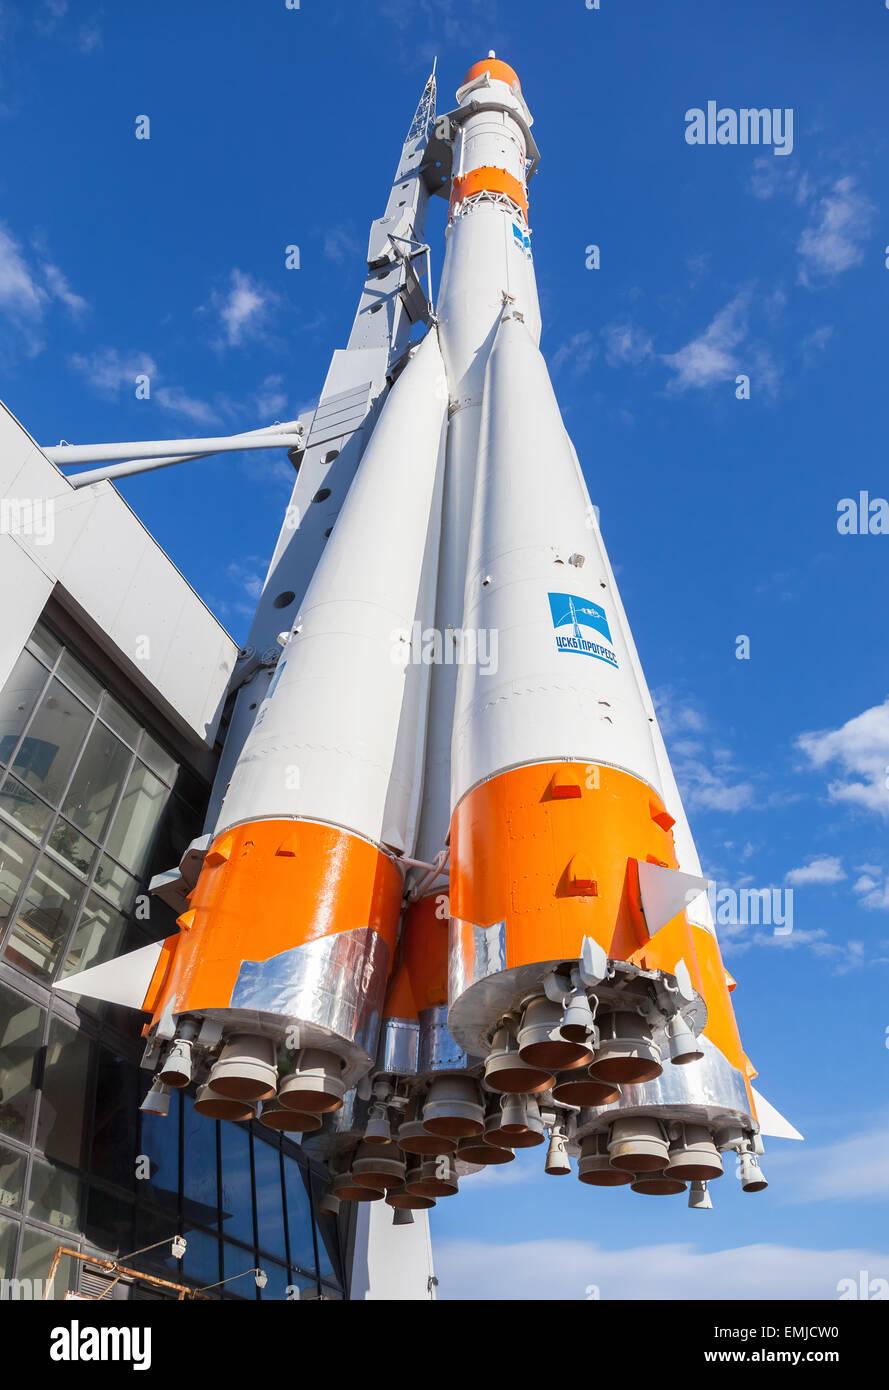 Real 'Soyuz' type rocket as monument. - Stock Image